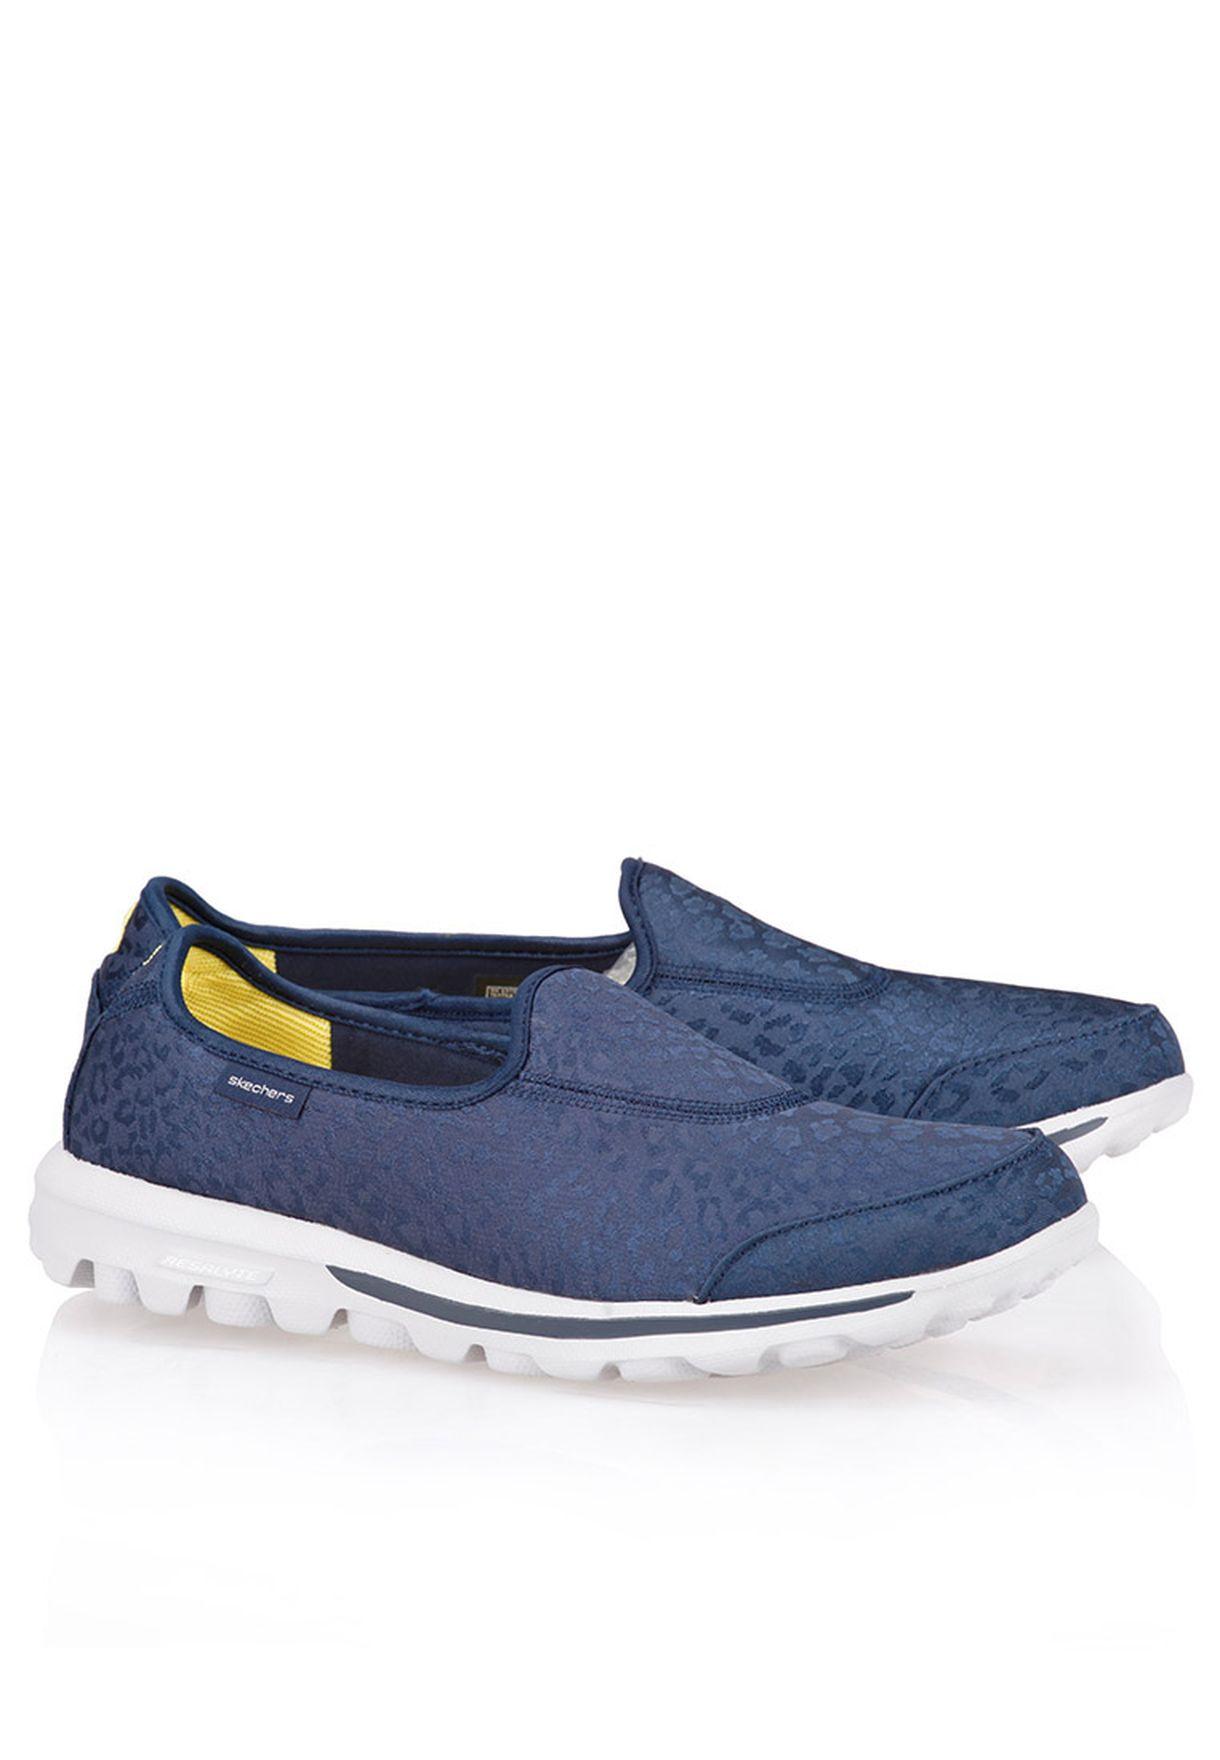 f4810563a9f0 Shop Skechers navy Go Walk Safari Comfort Shoes 13753-NVY for Women in  Kuwait - SK034SH28GBJ